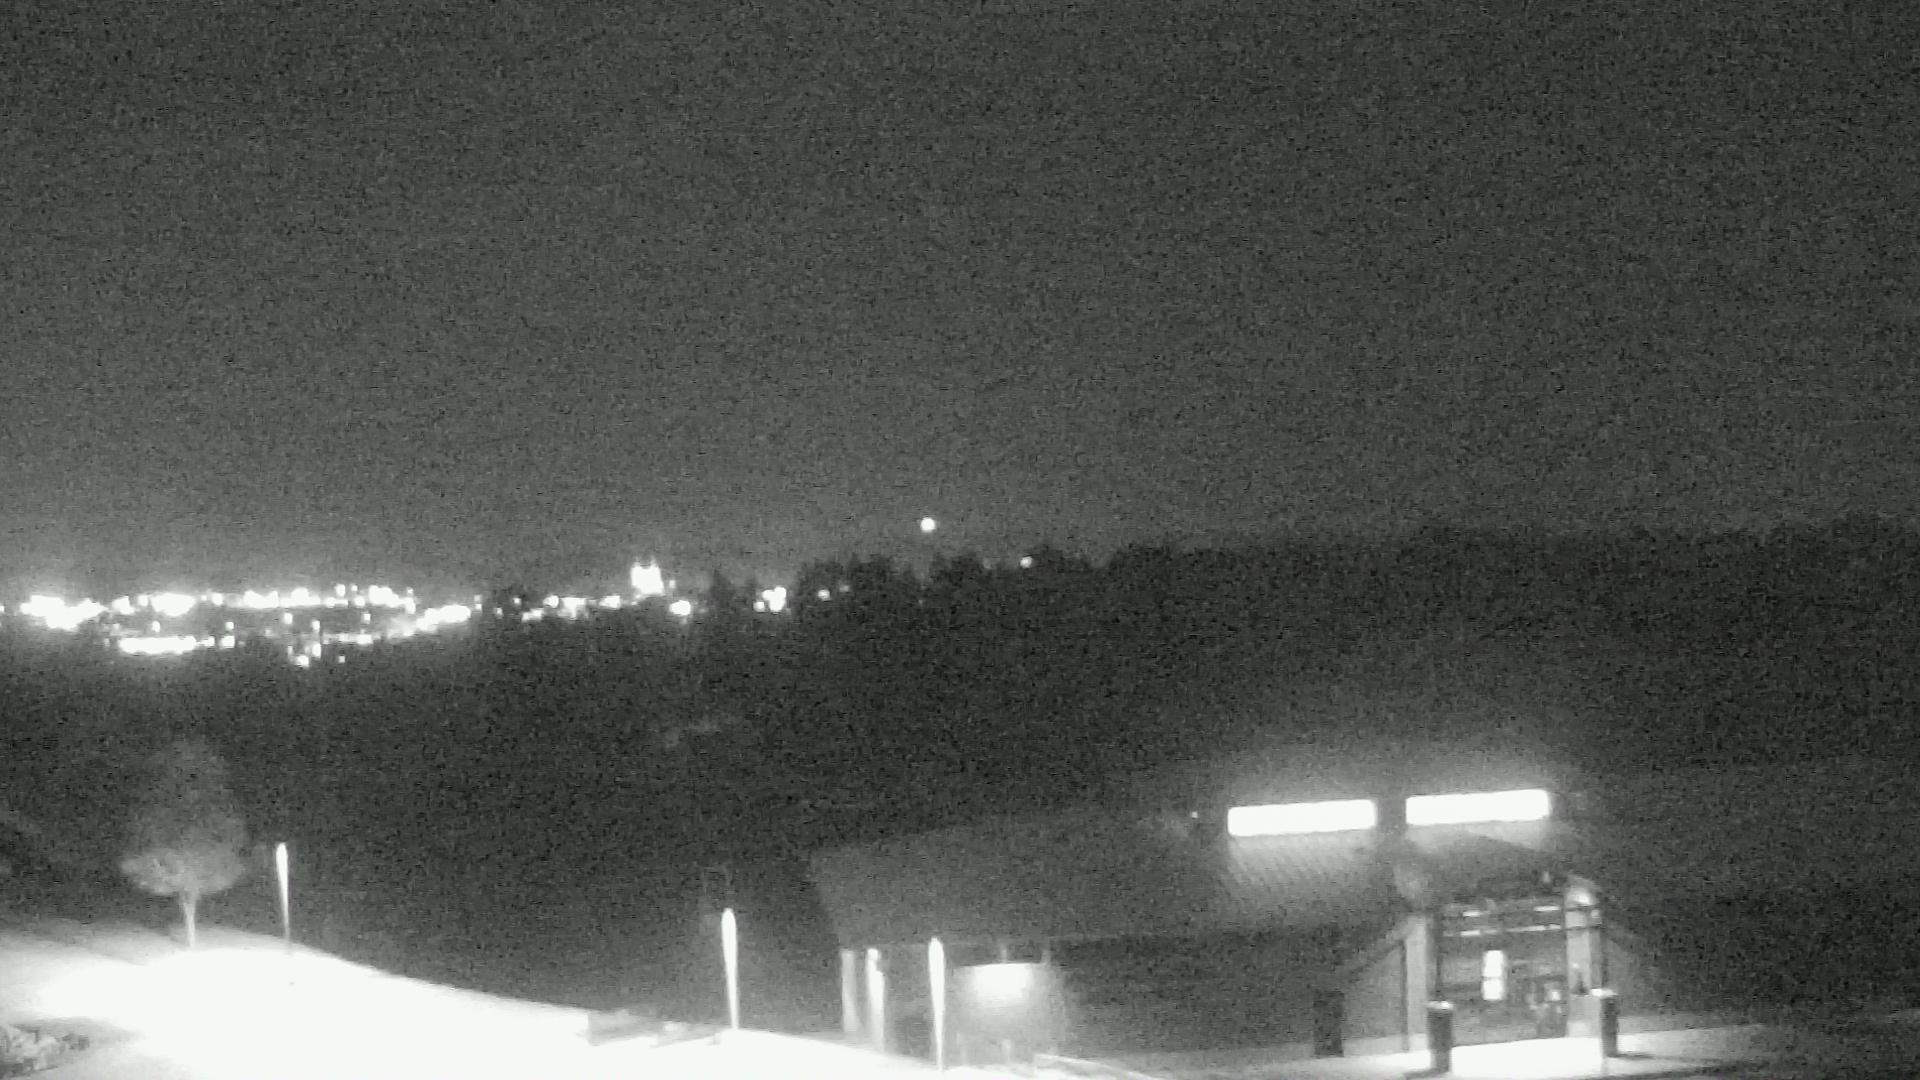 latrobe, pennsylvania instacam weatherbug webcam